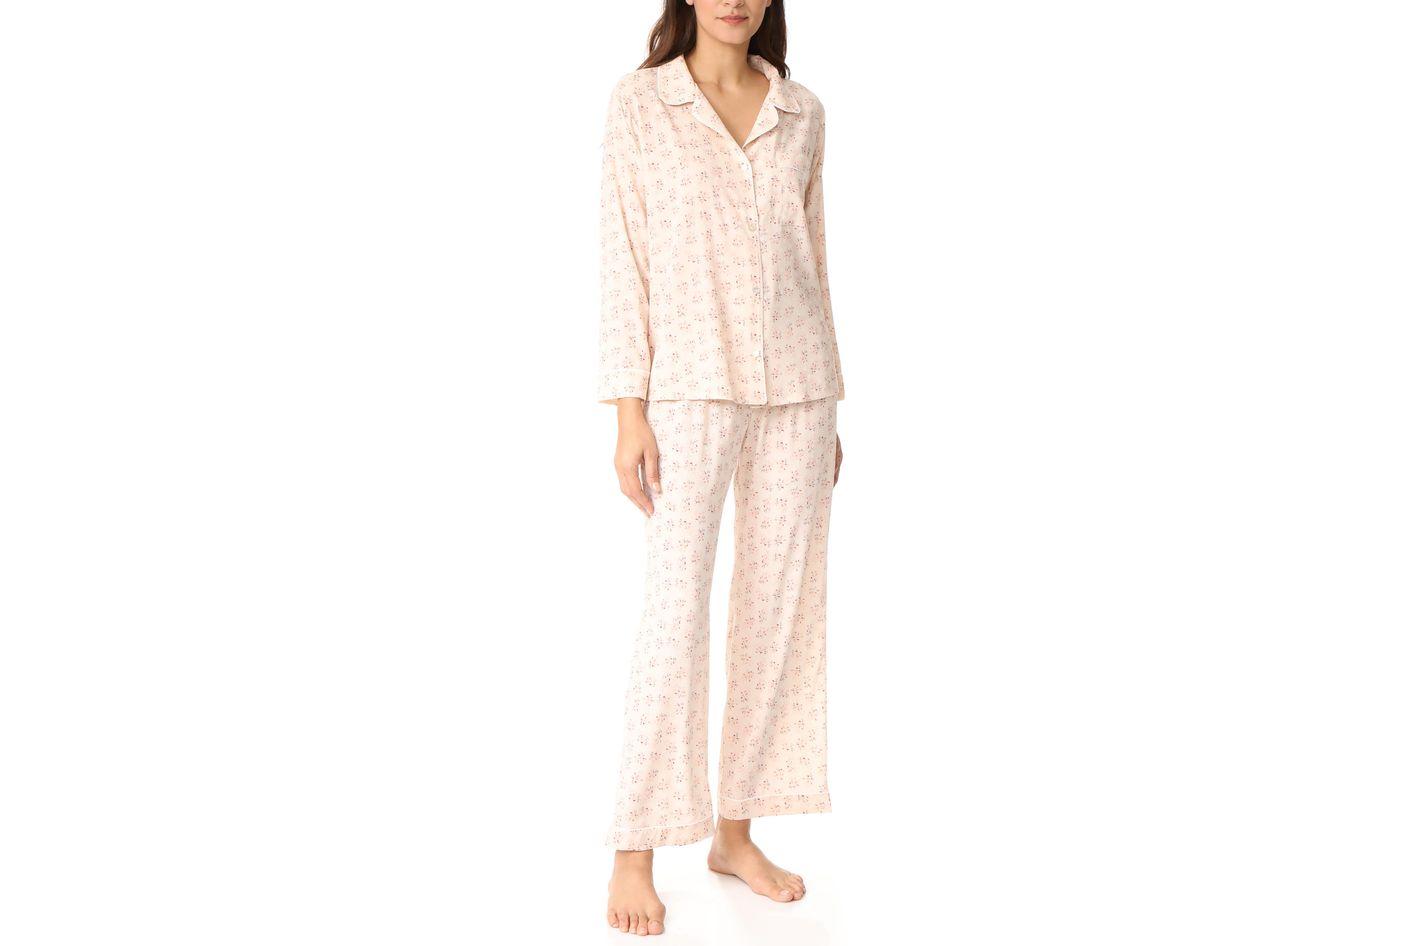 Eberjey x Rebecca Taylor Pajama Set